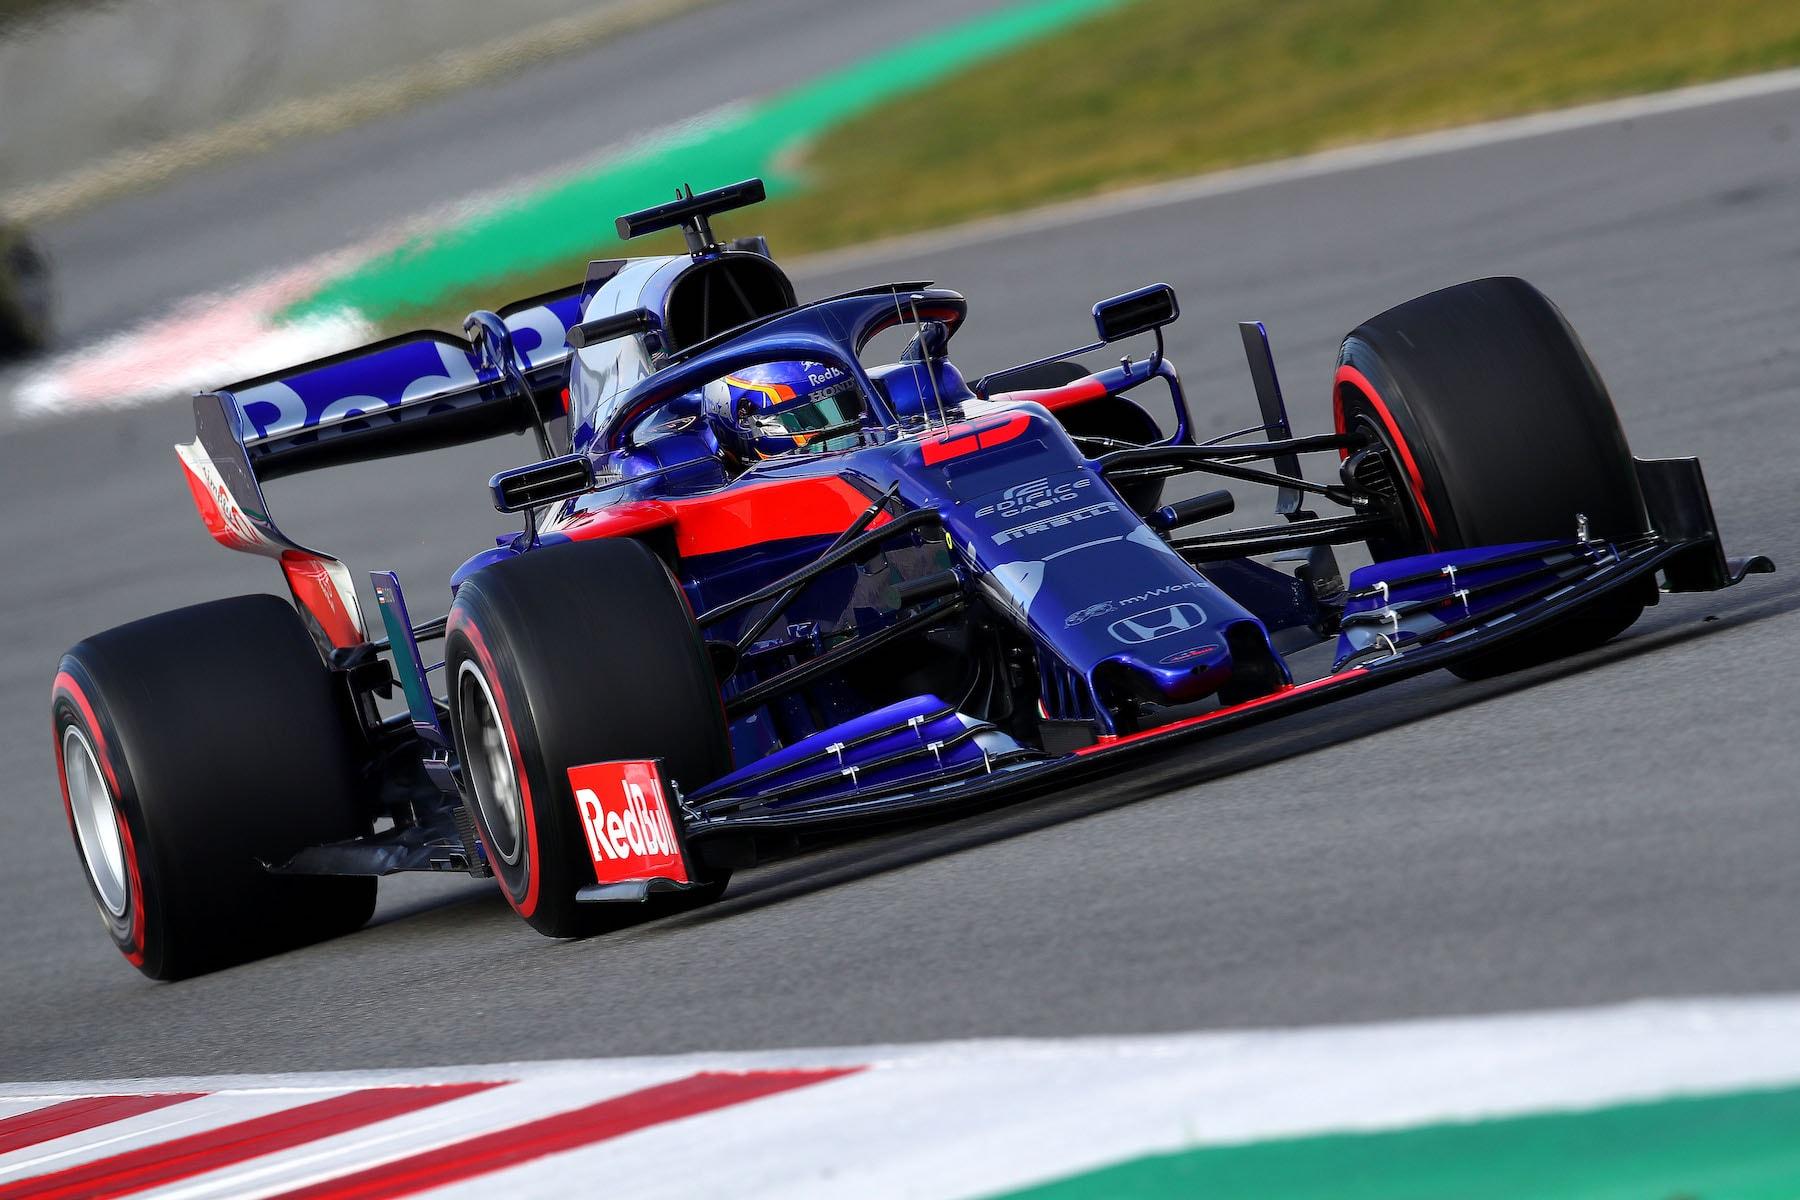 2019 Alex Albon   Toro Rosso STR14   2019 Barcelona T1 D2 3 copy.jpg